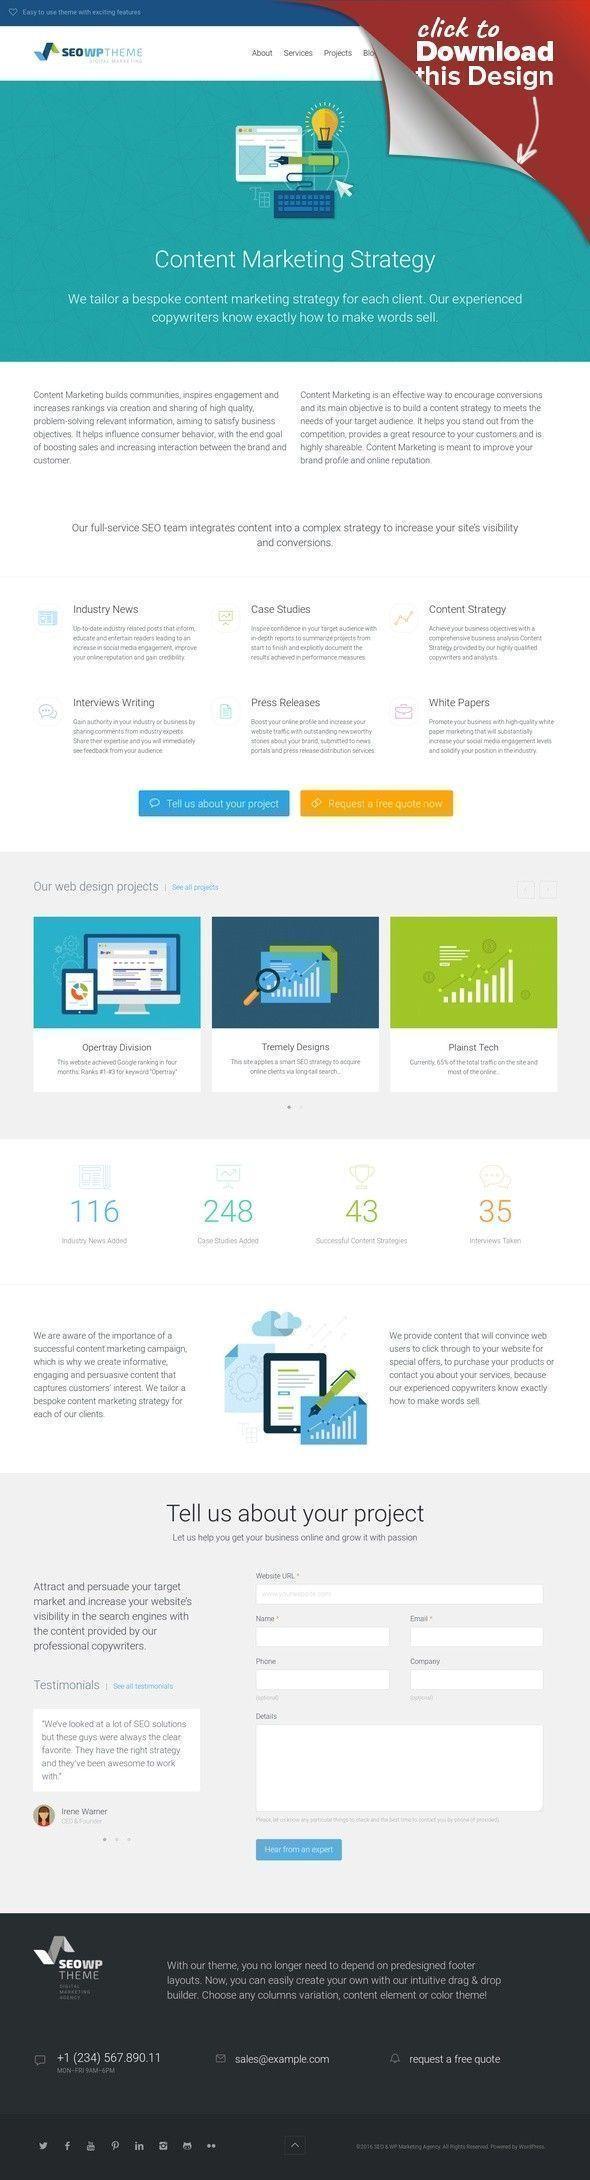 SEO WP Online Marketing u0026 Social Media